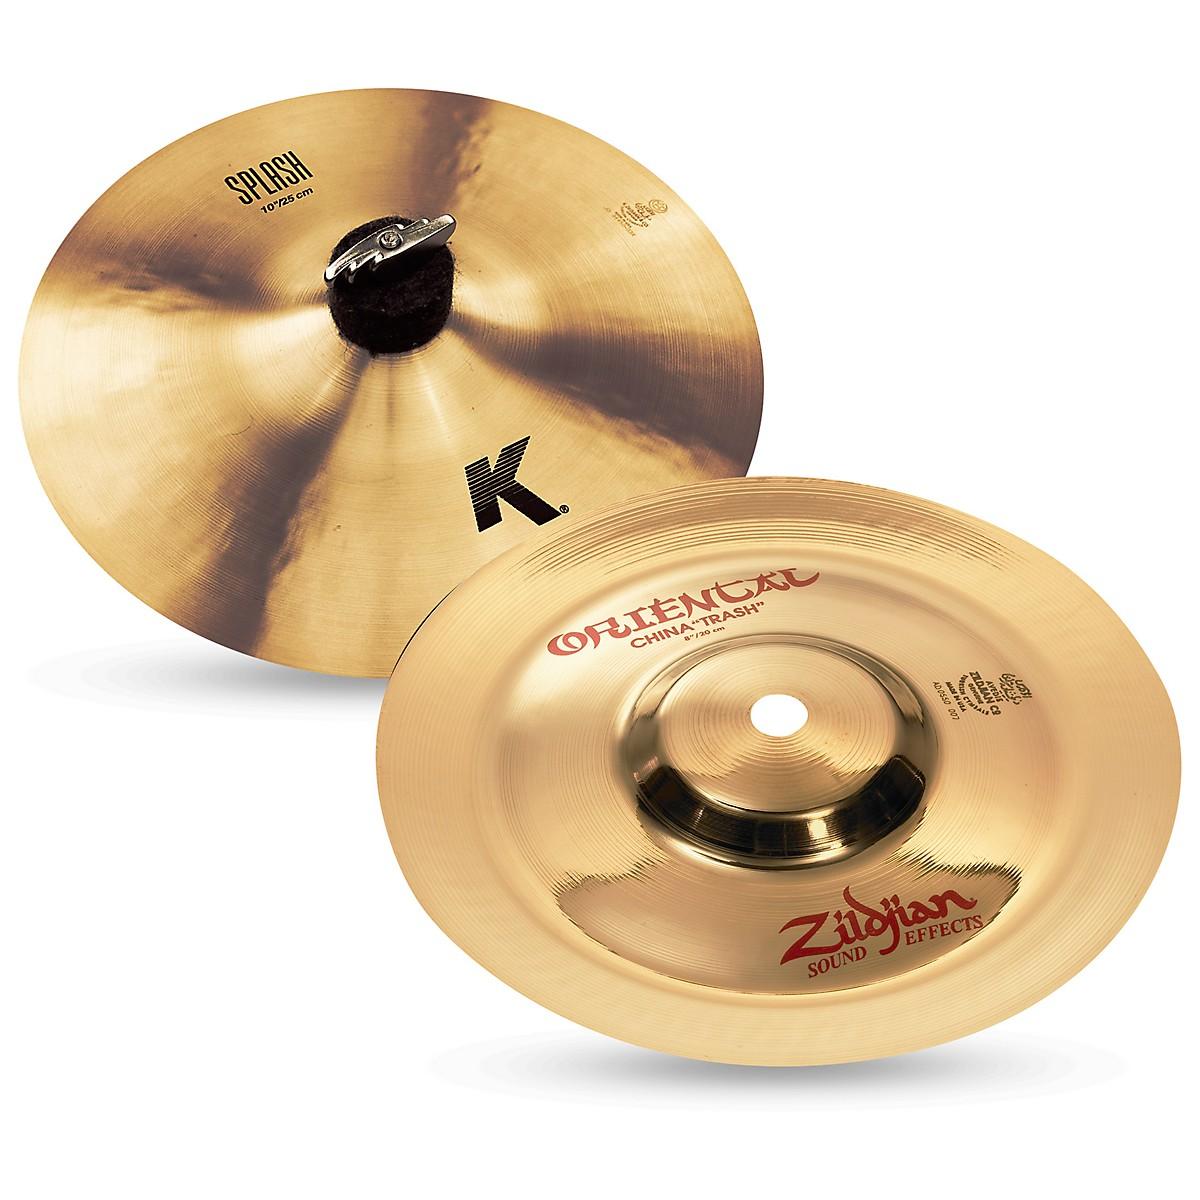 Zildjian Stacktober Day 1 Cymbal Set